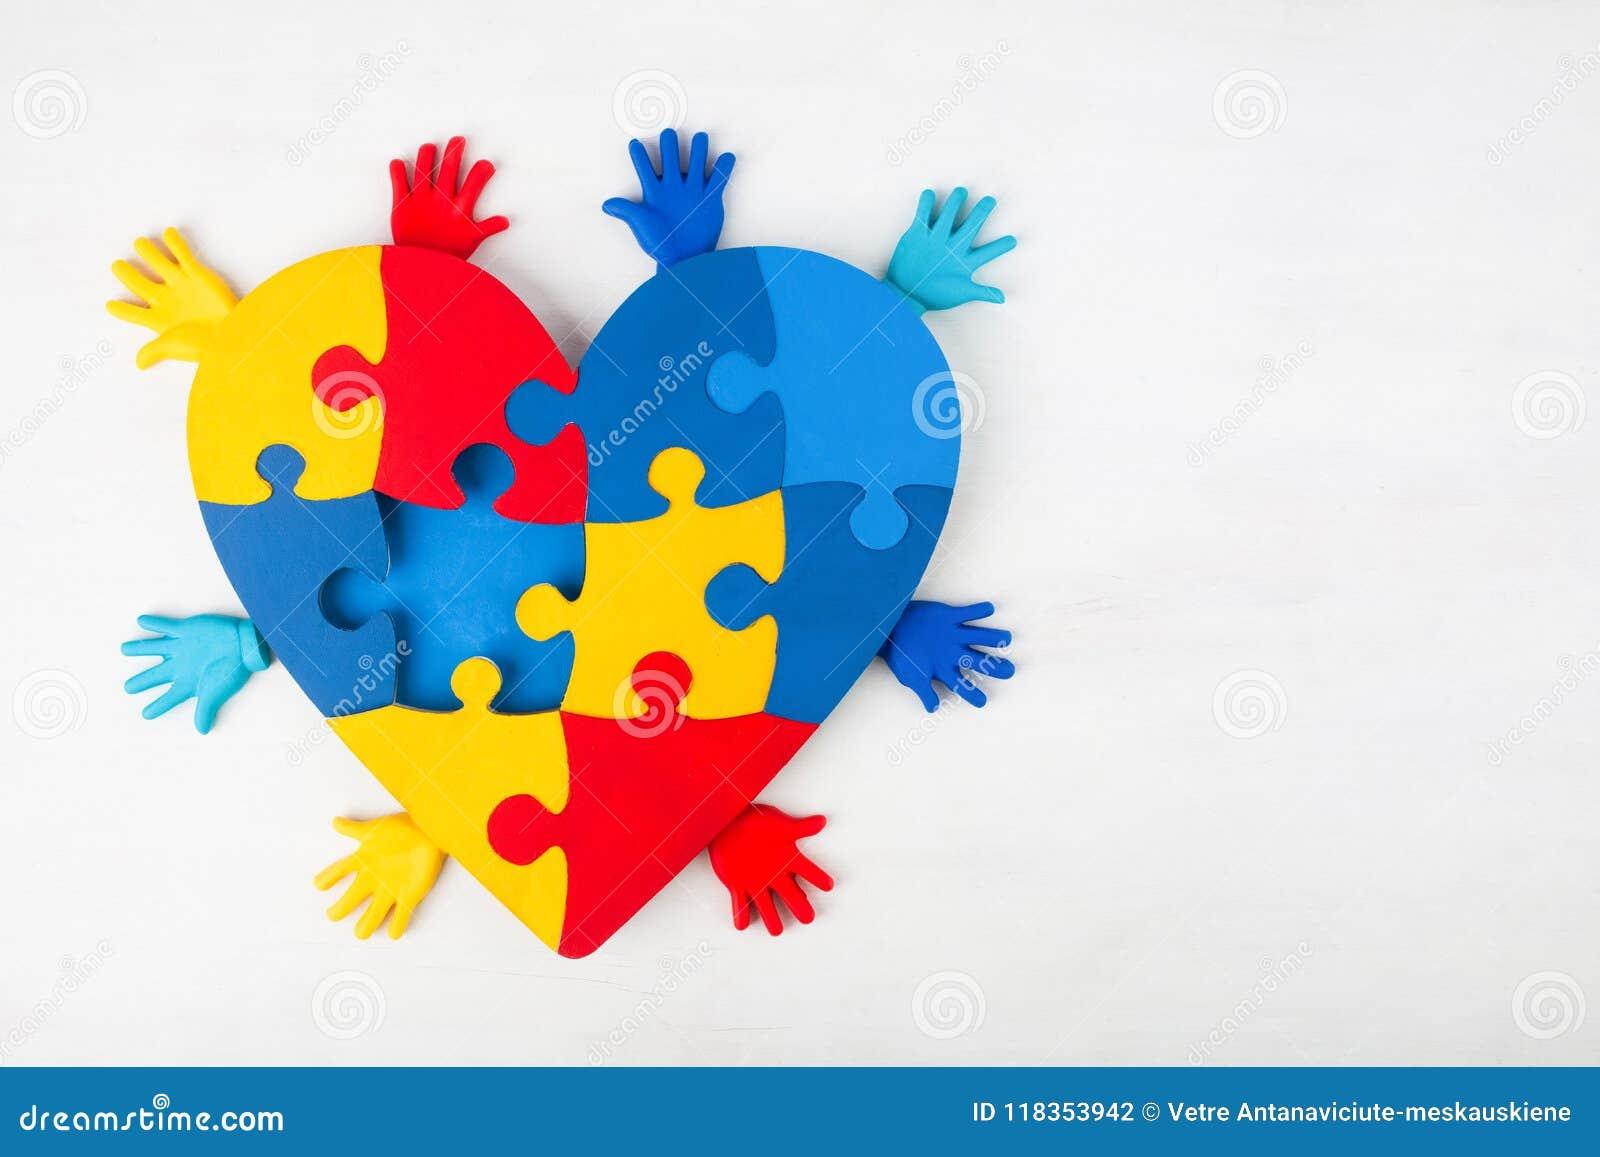 Puzzle heart hands support autism awareness